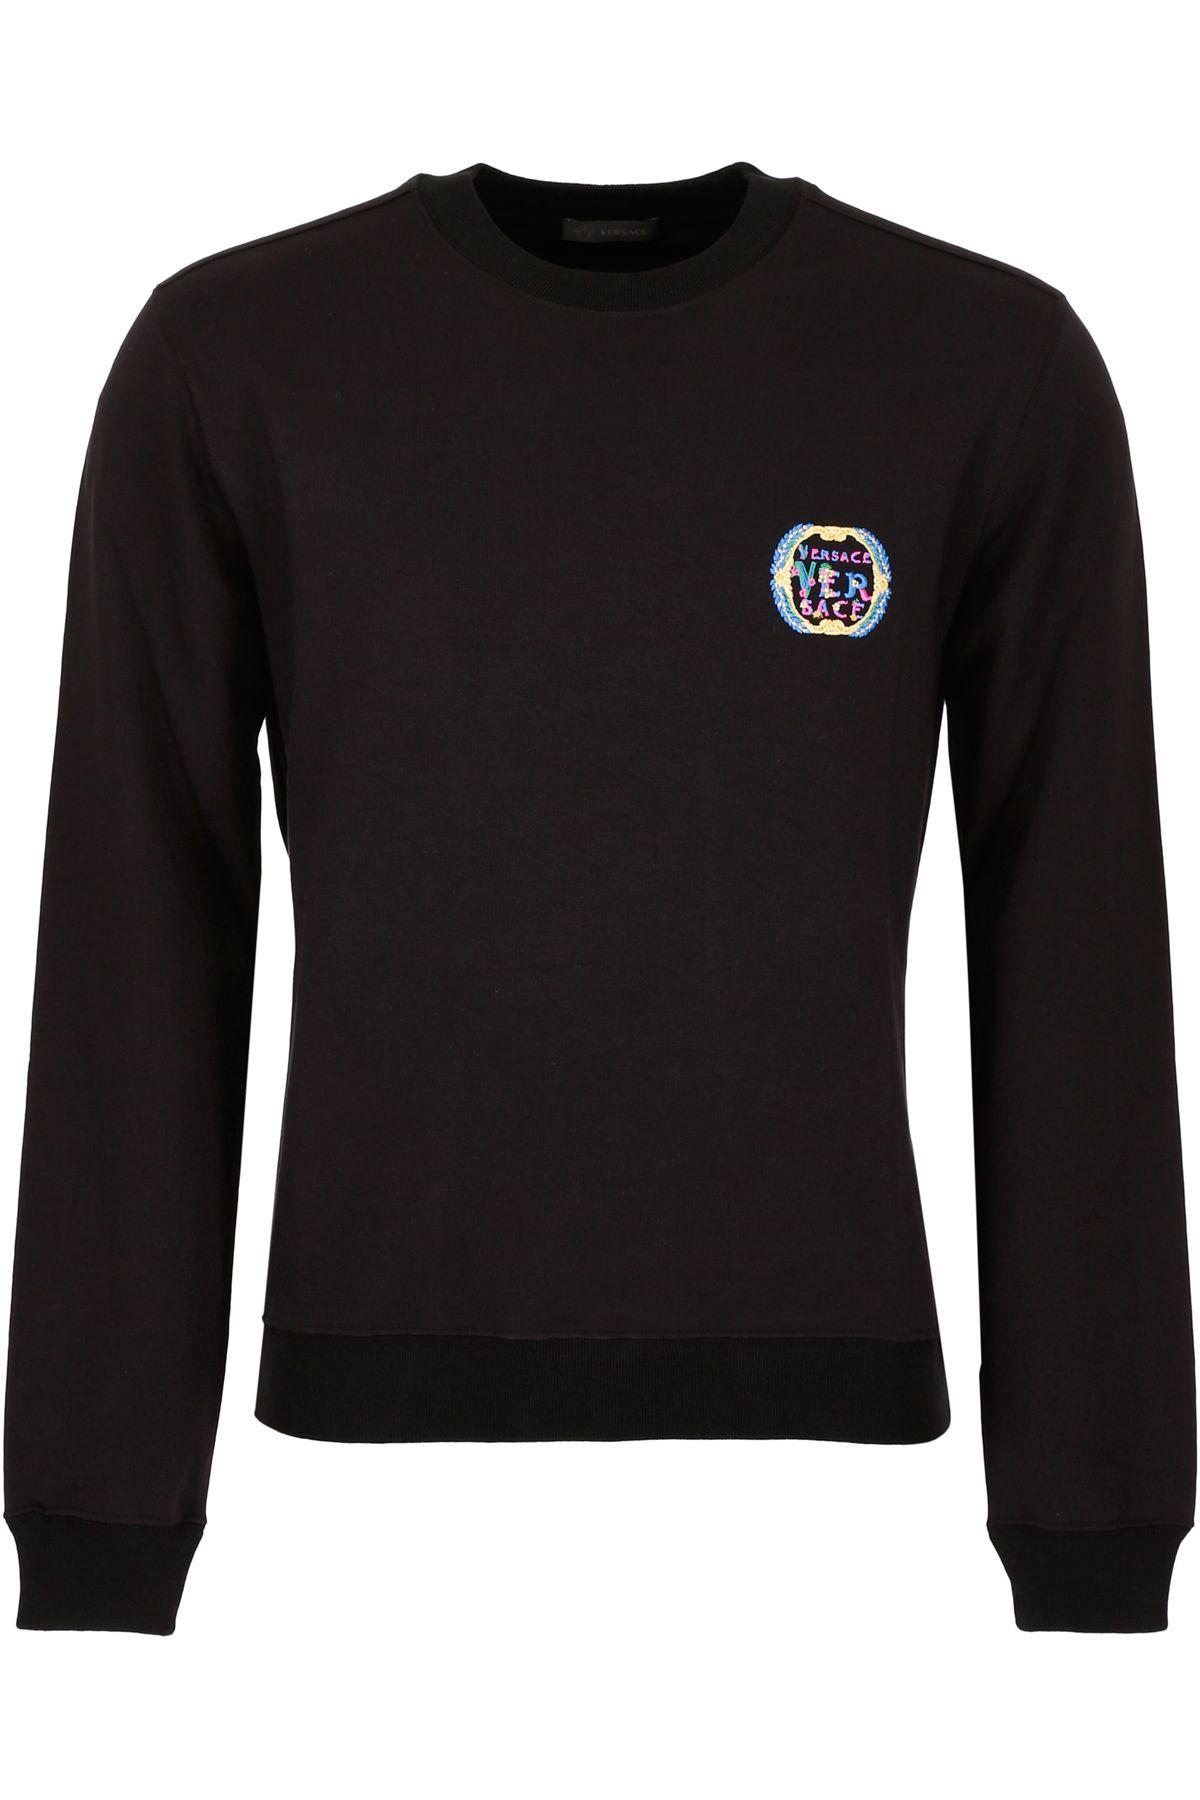 Versace Embroidered Sweatshirt